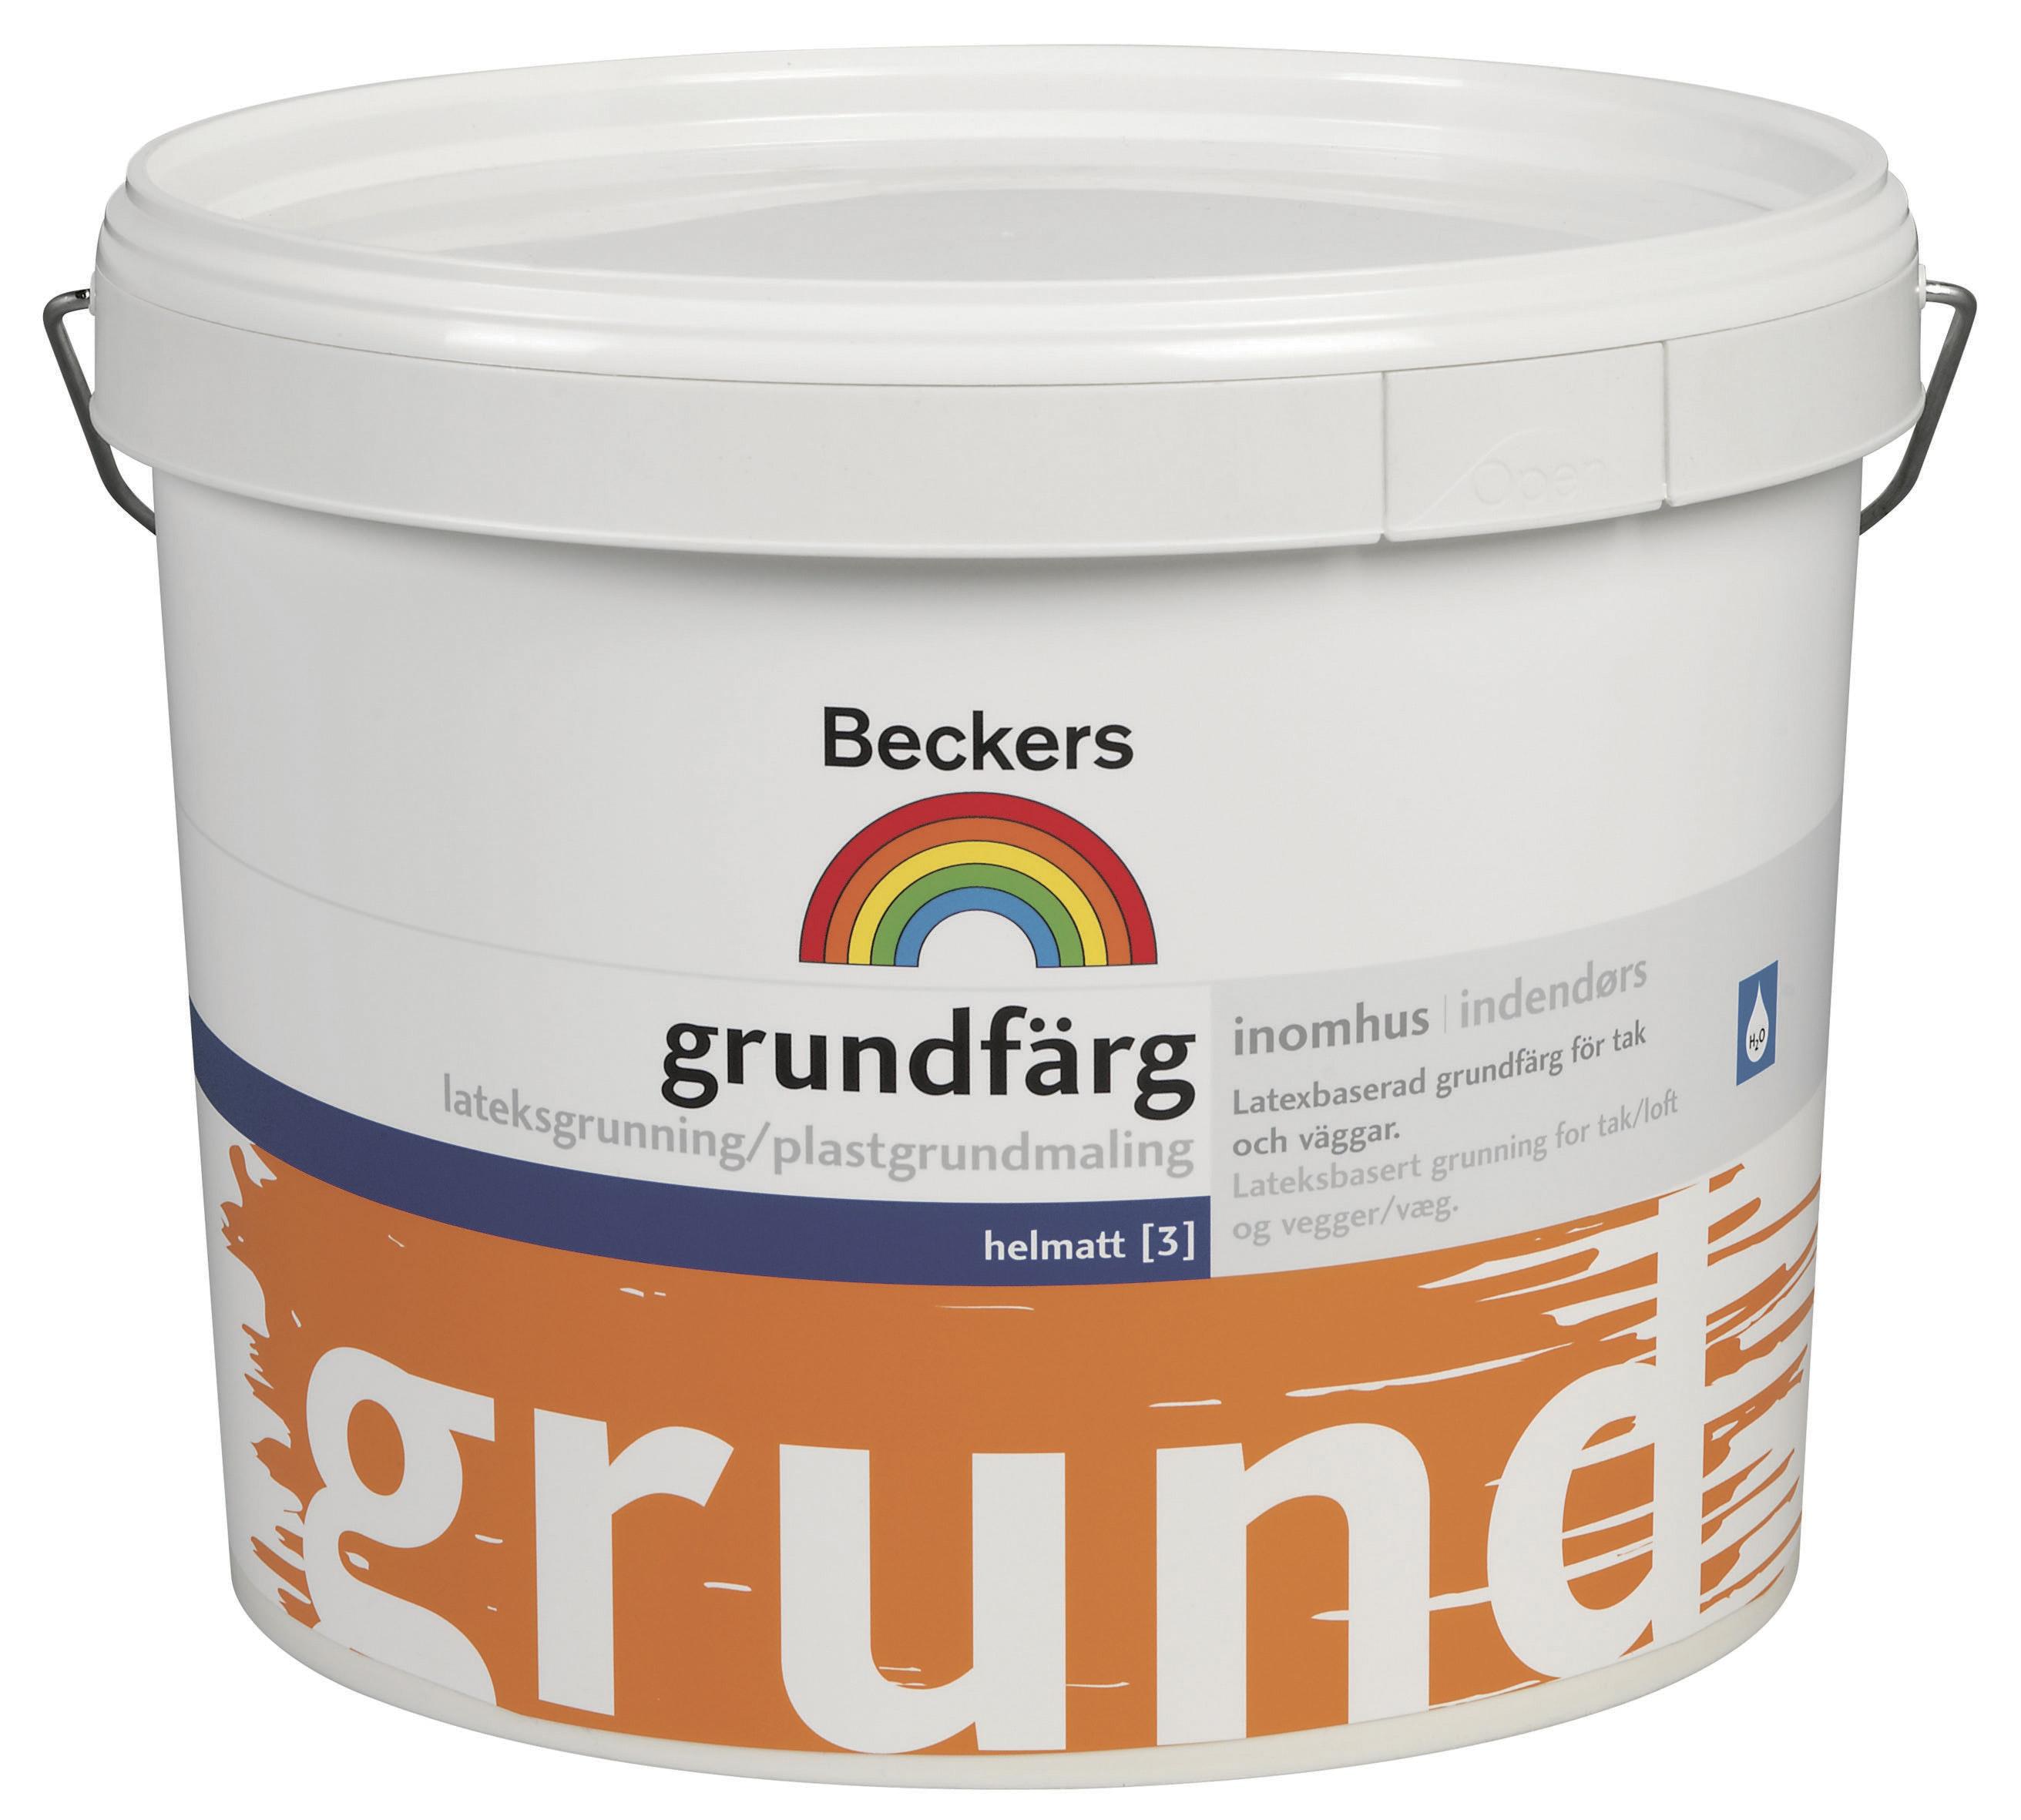 Grundfärg Beckers Helmatt Vit 10l